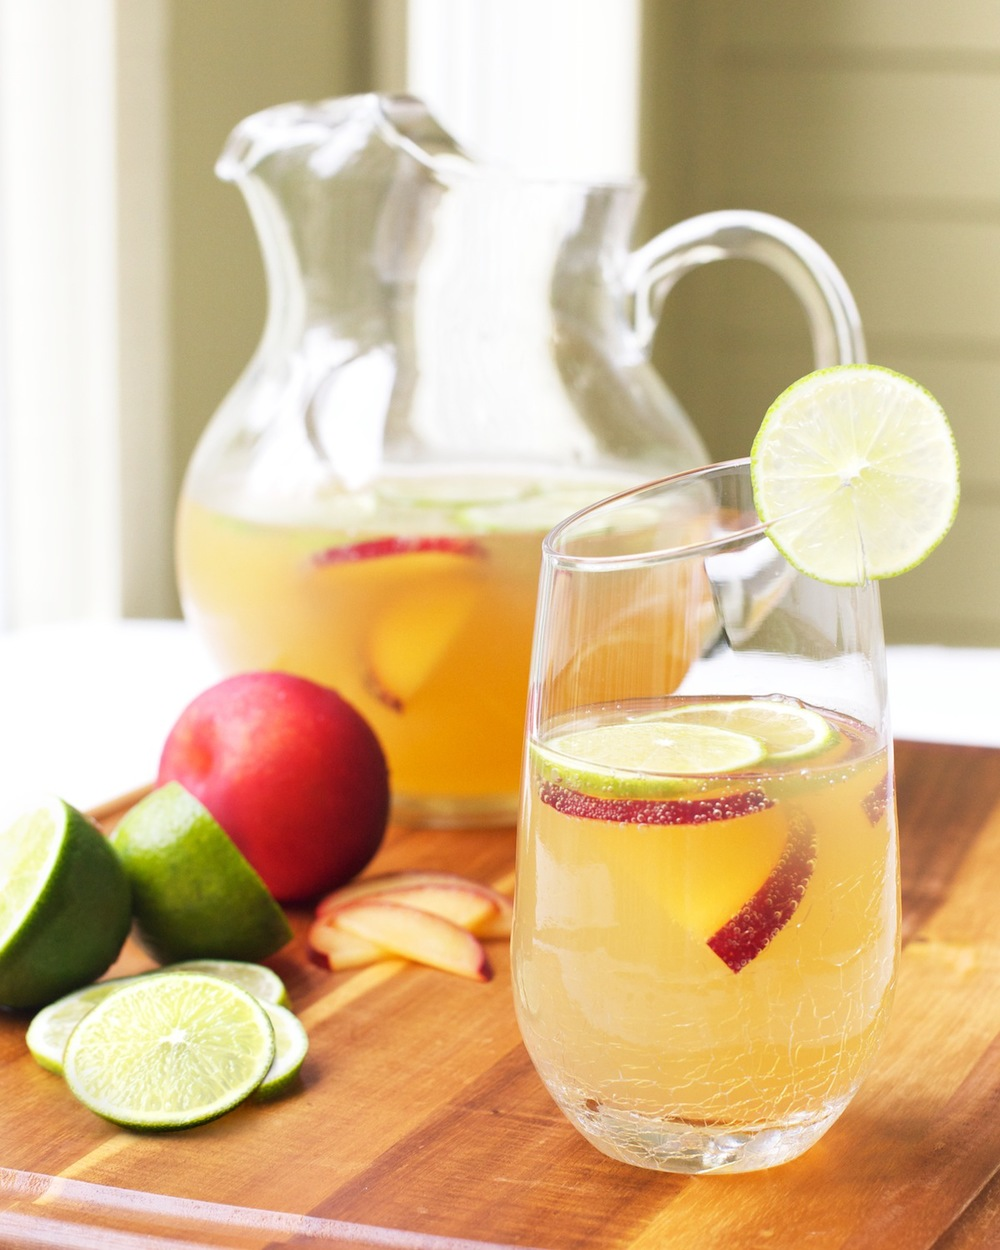 Sparkling Plum White Tea with Lime